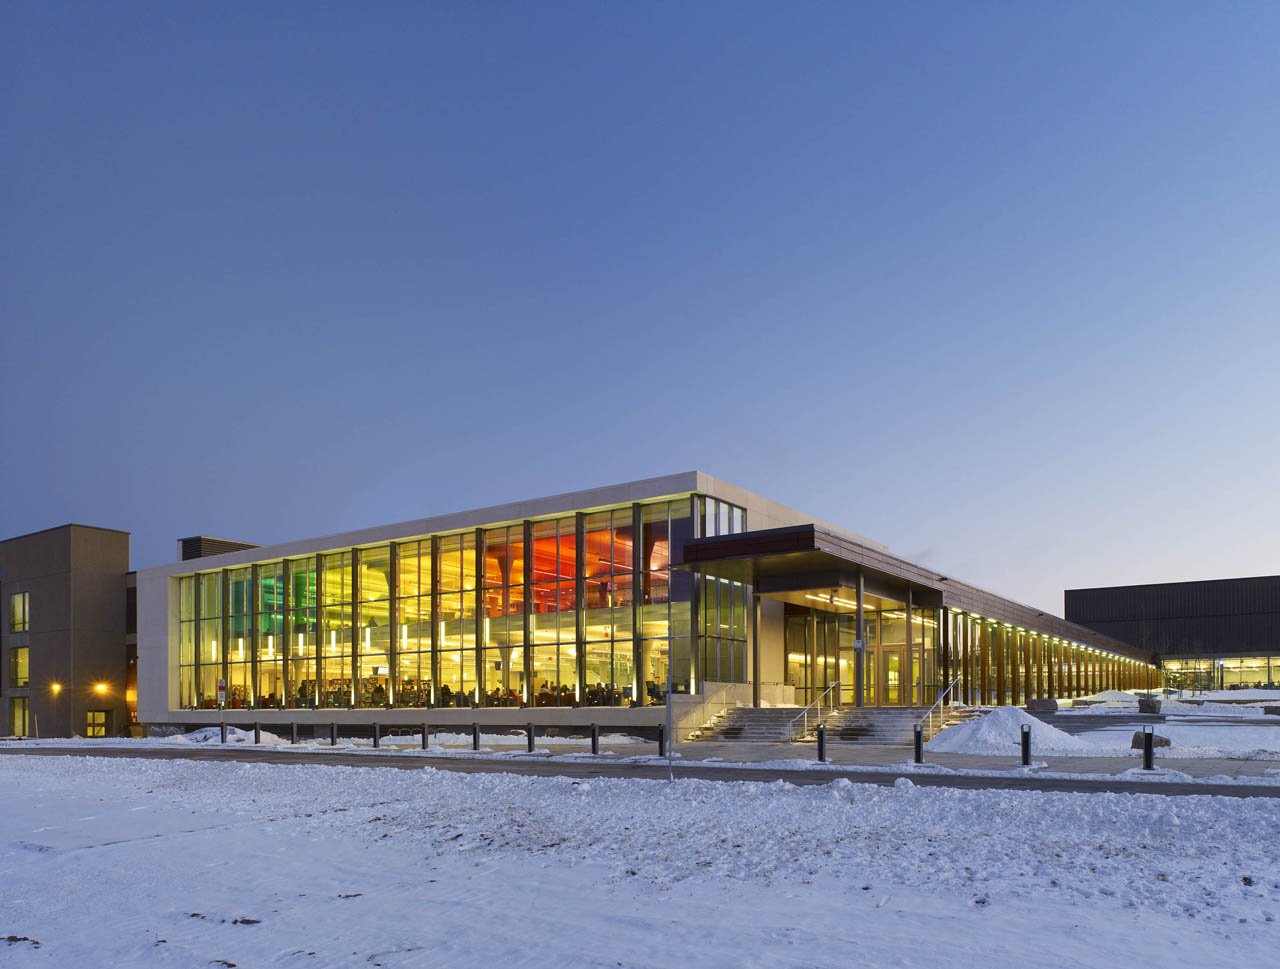 Mohawk College / Zeidler Partnership Architects, © Tom Arban